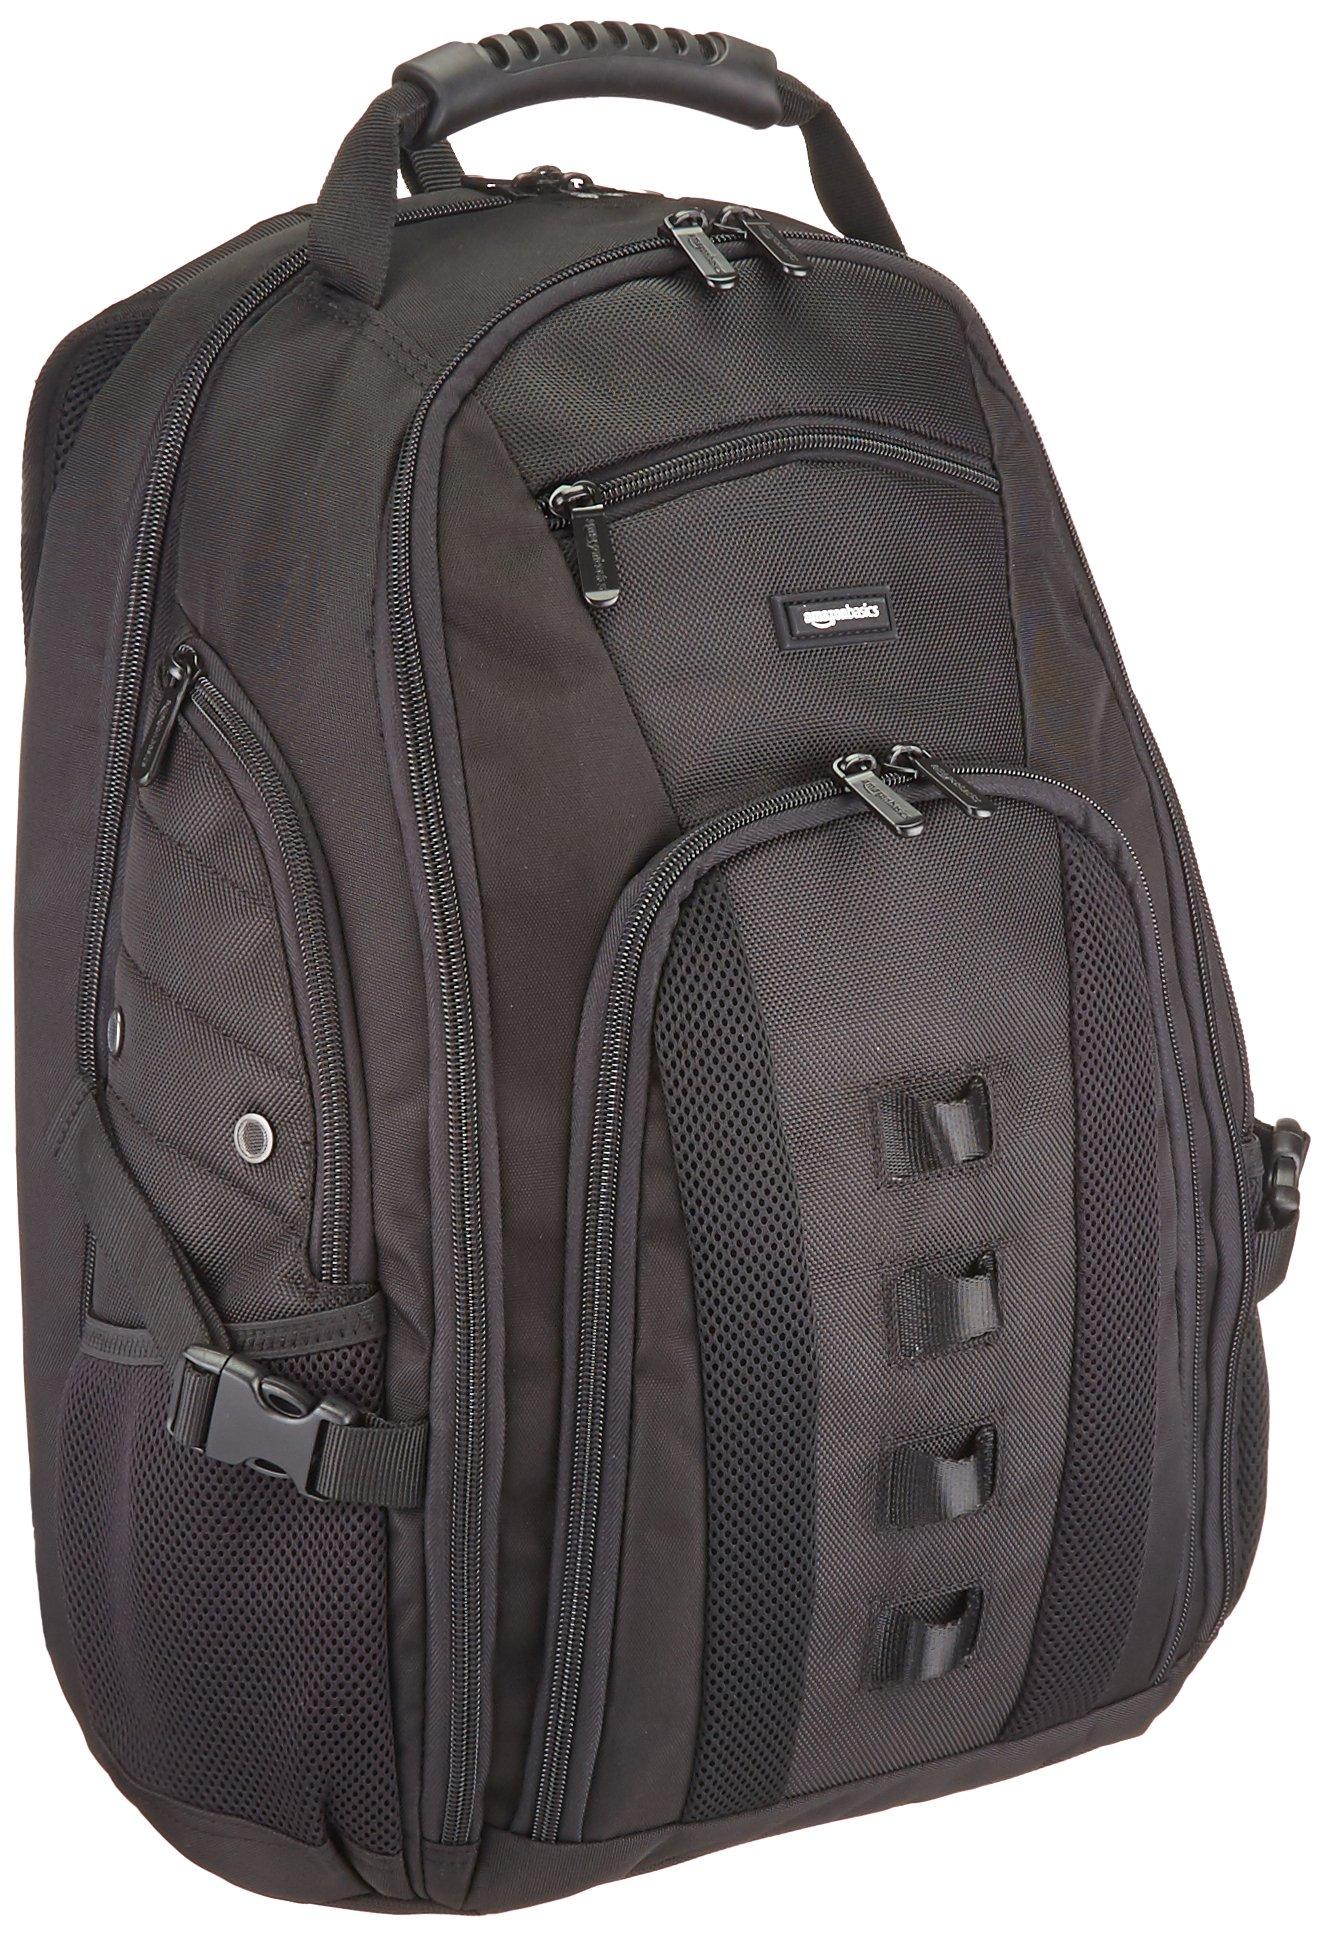 Amazonbasics Travel 17 Inch Laptop Computer Backpack by AmazonBasics